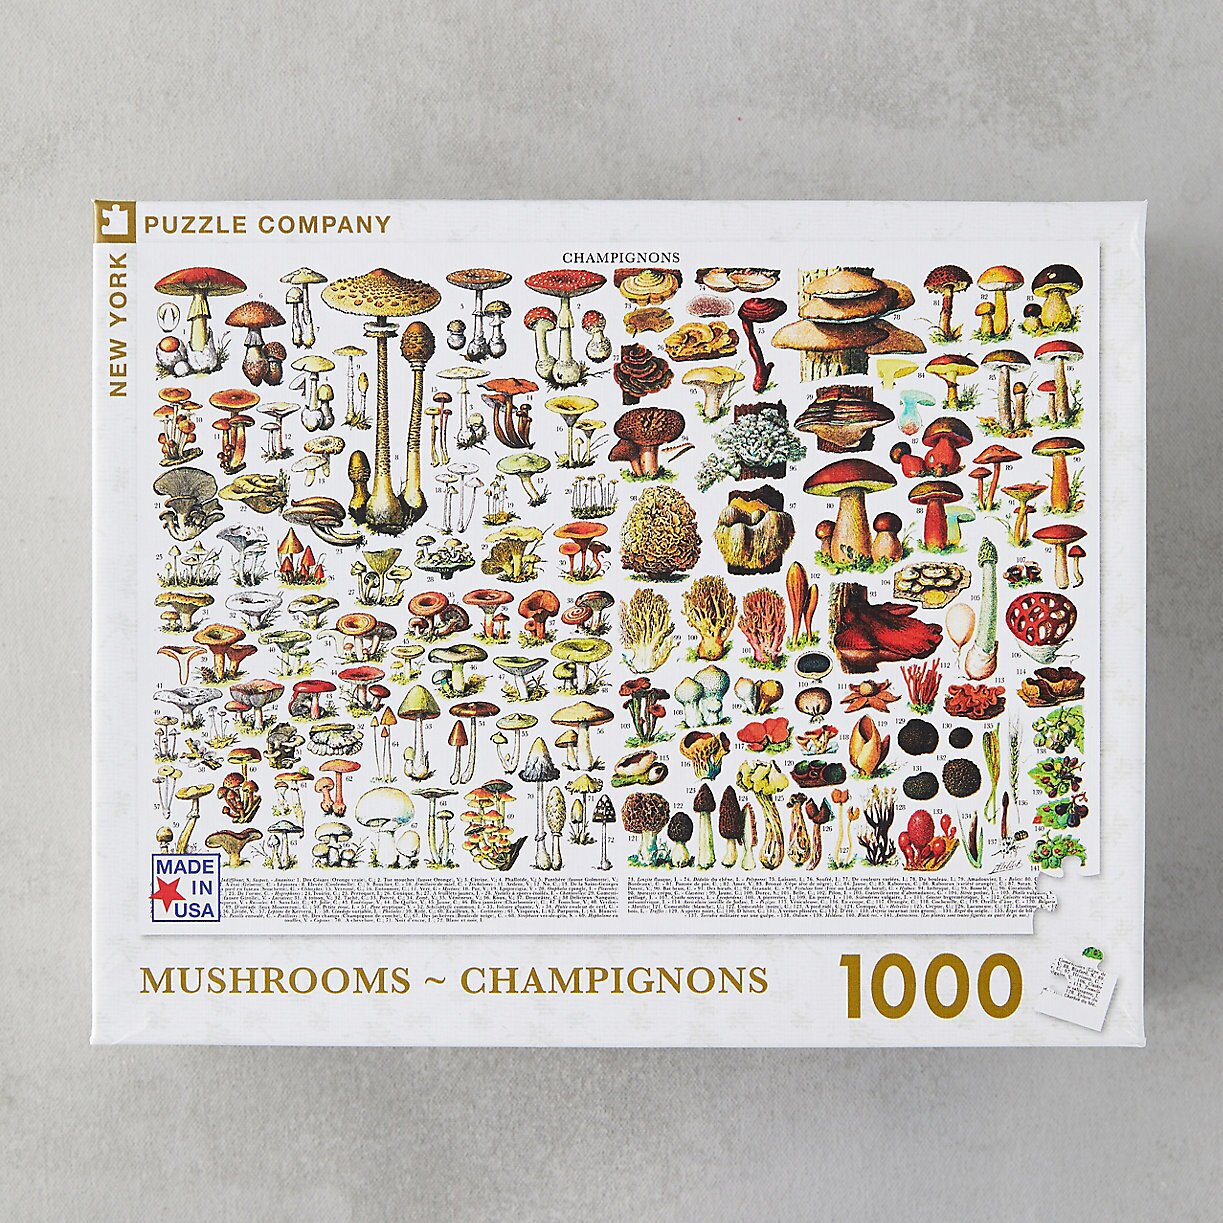 New York Puzzle Company Mushroom Field Guide Puzzle